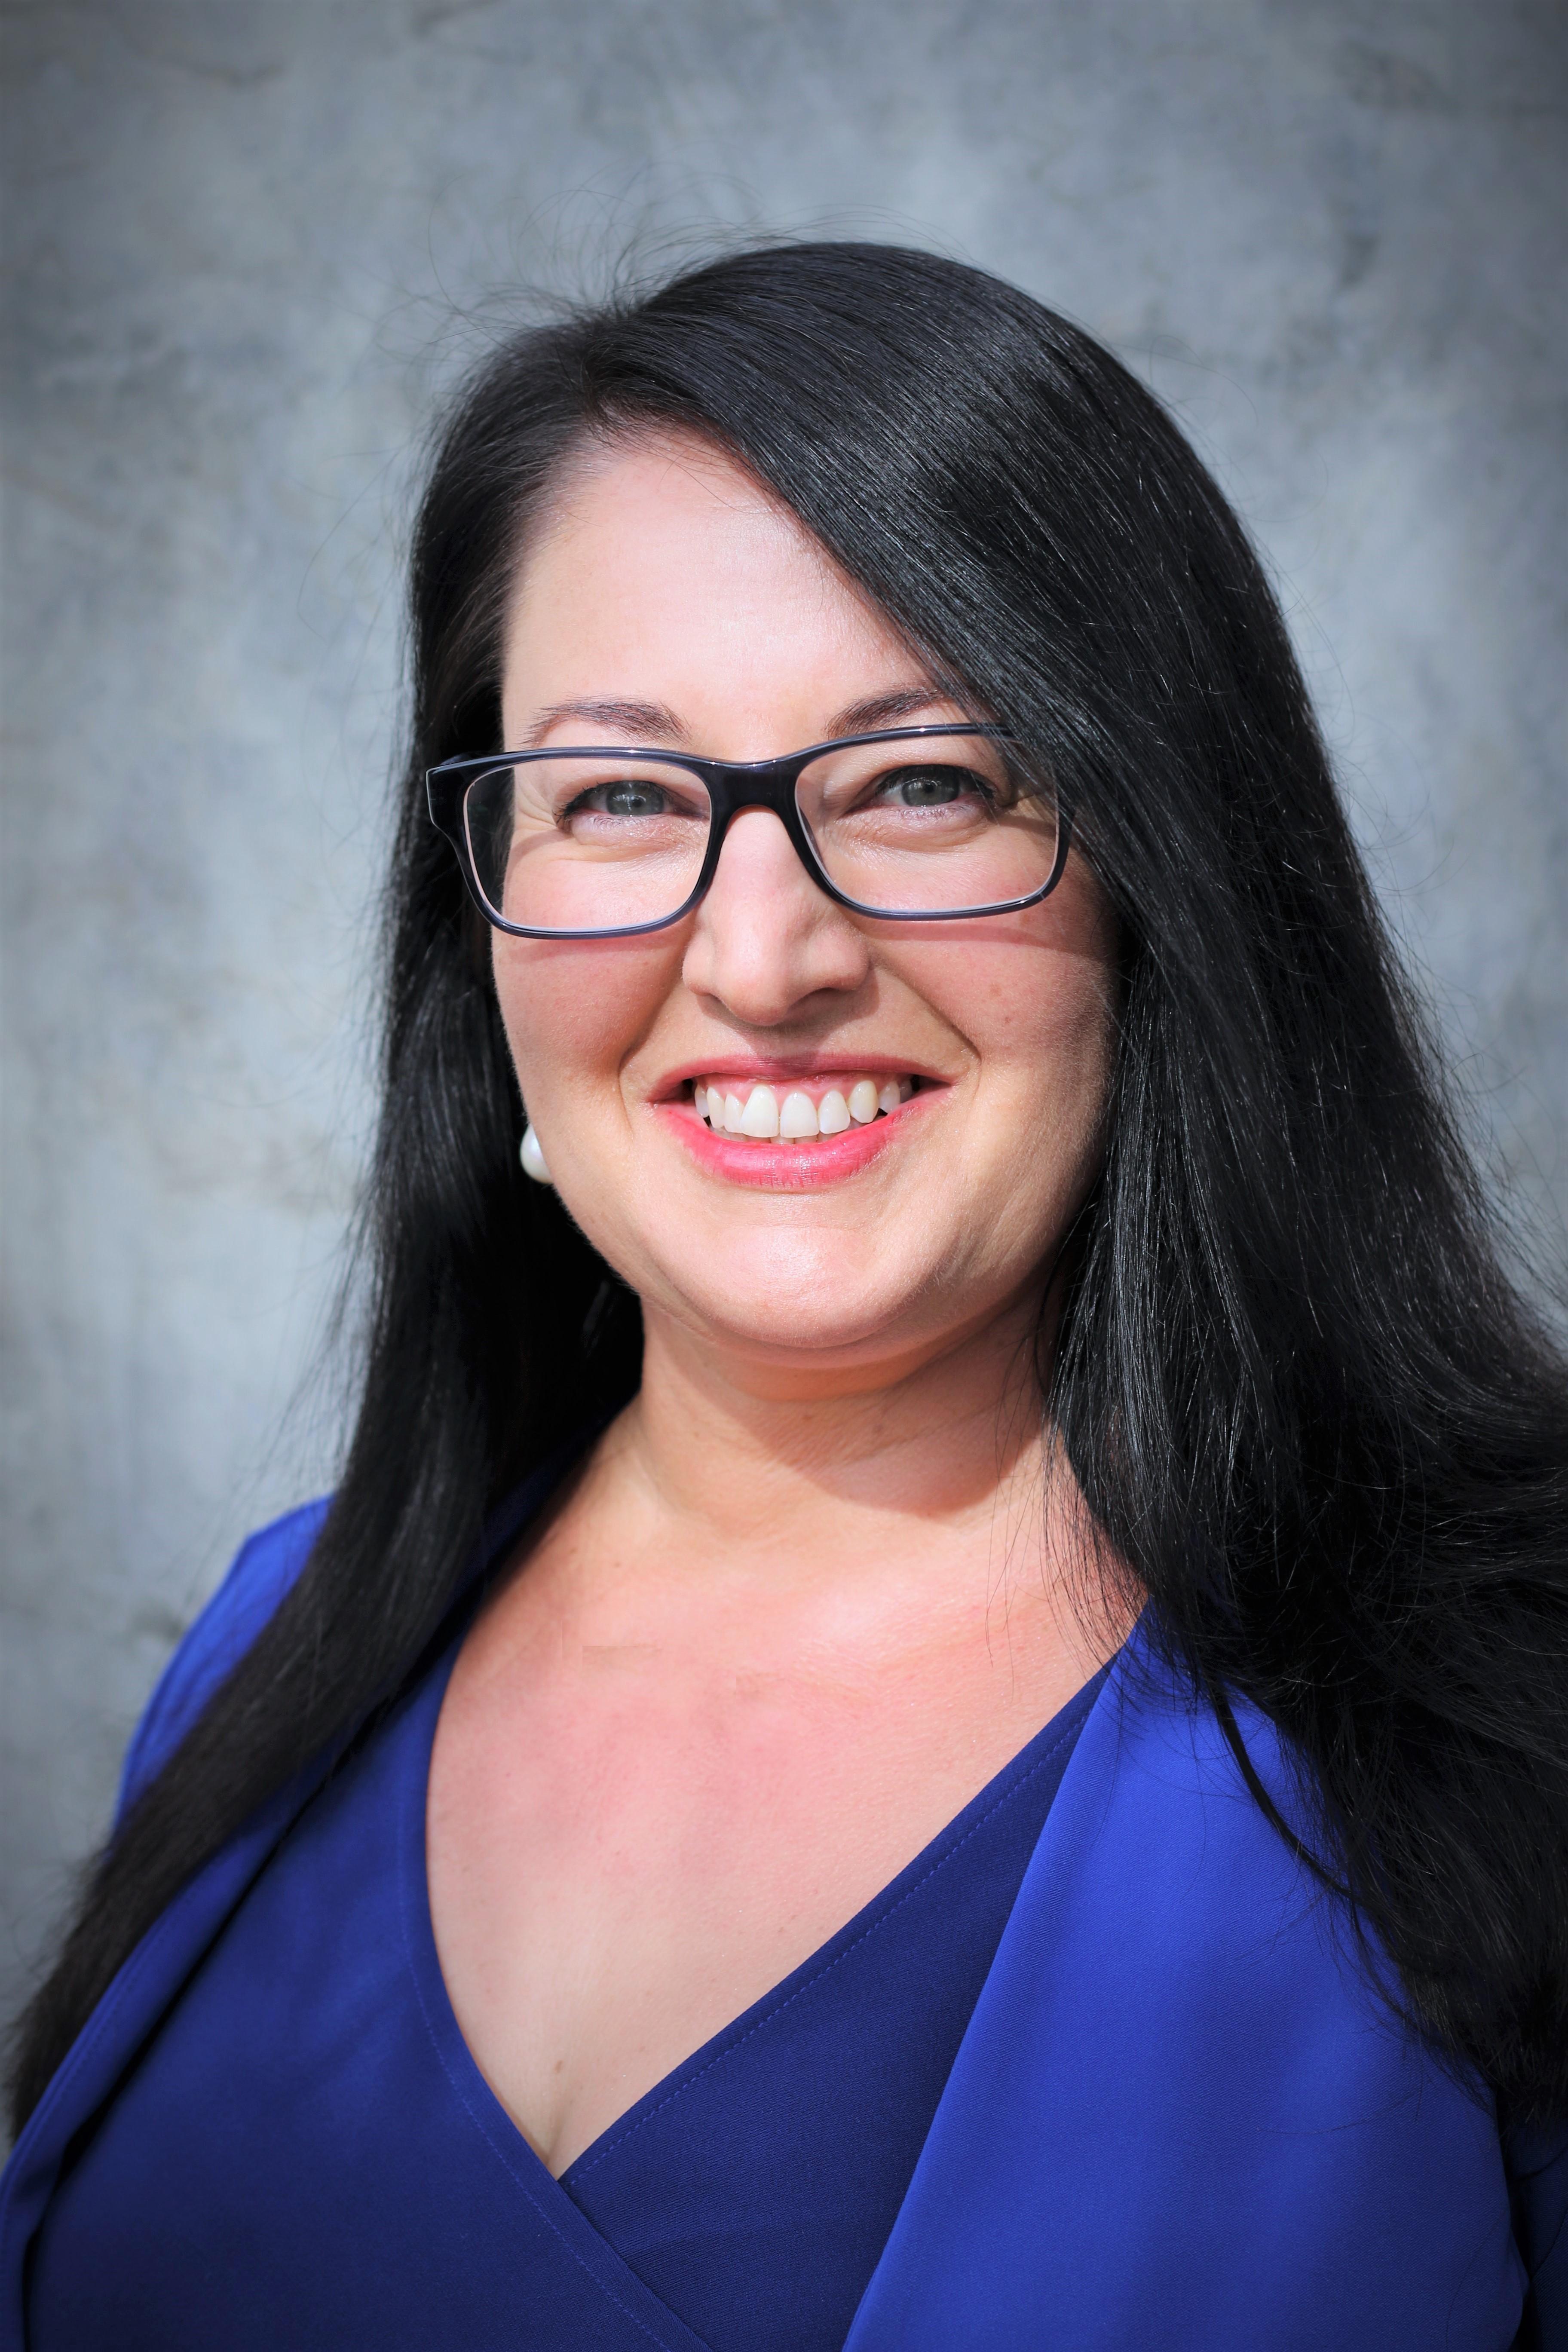 Dr Deborah Netolicky